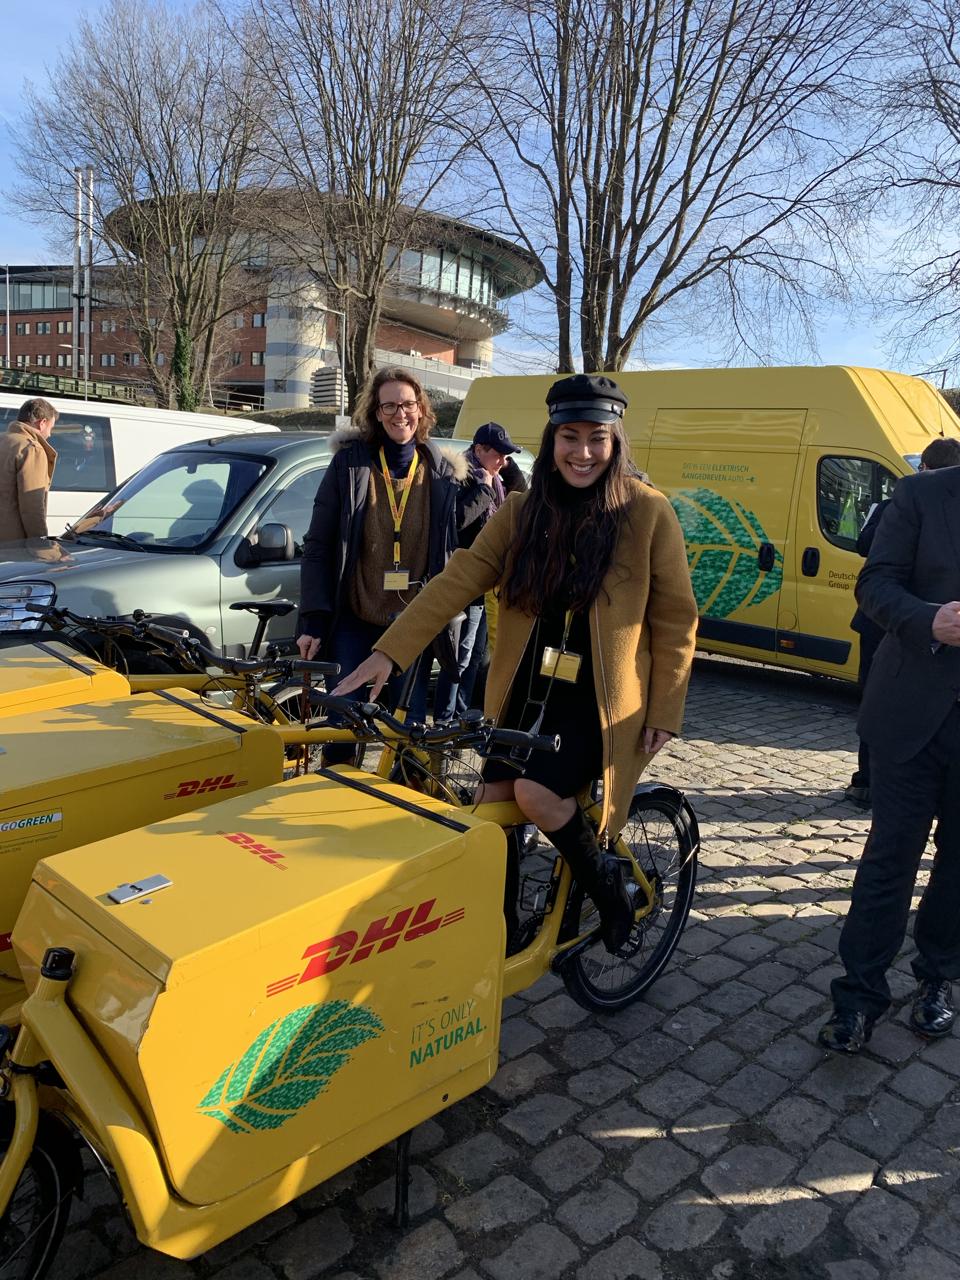 Lieferfahrrad von DHL in Amsterdam / Social Media Marketing für DHL